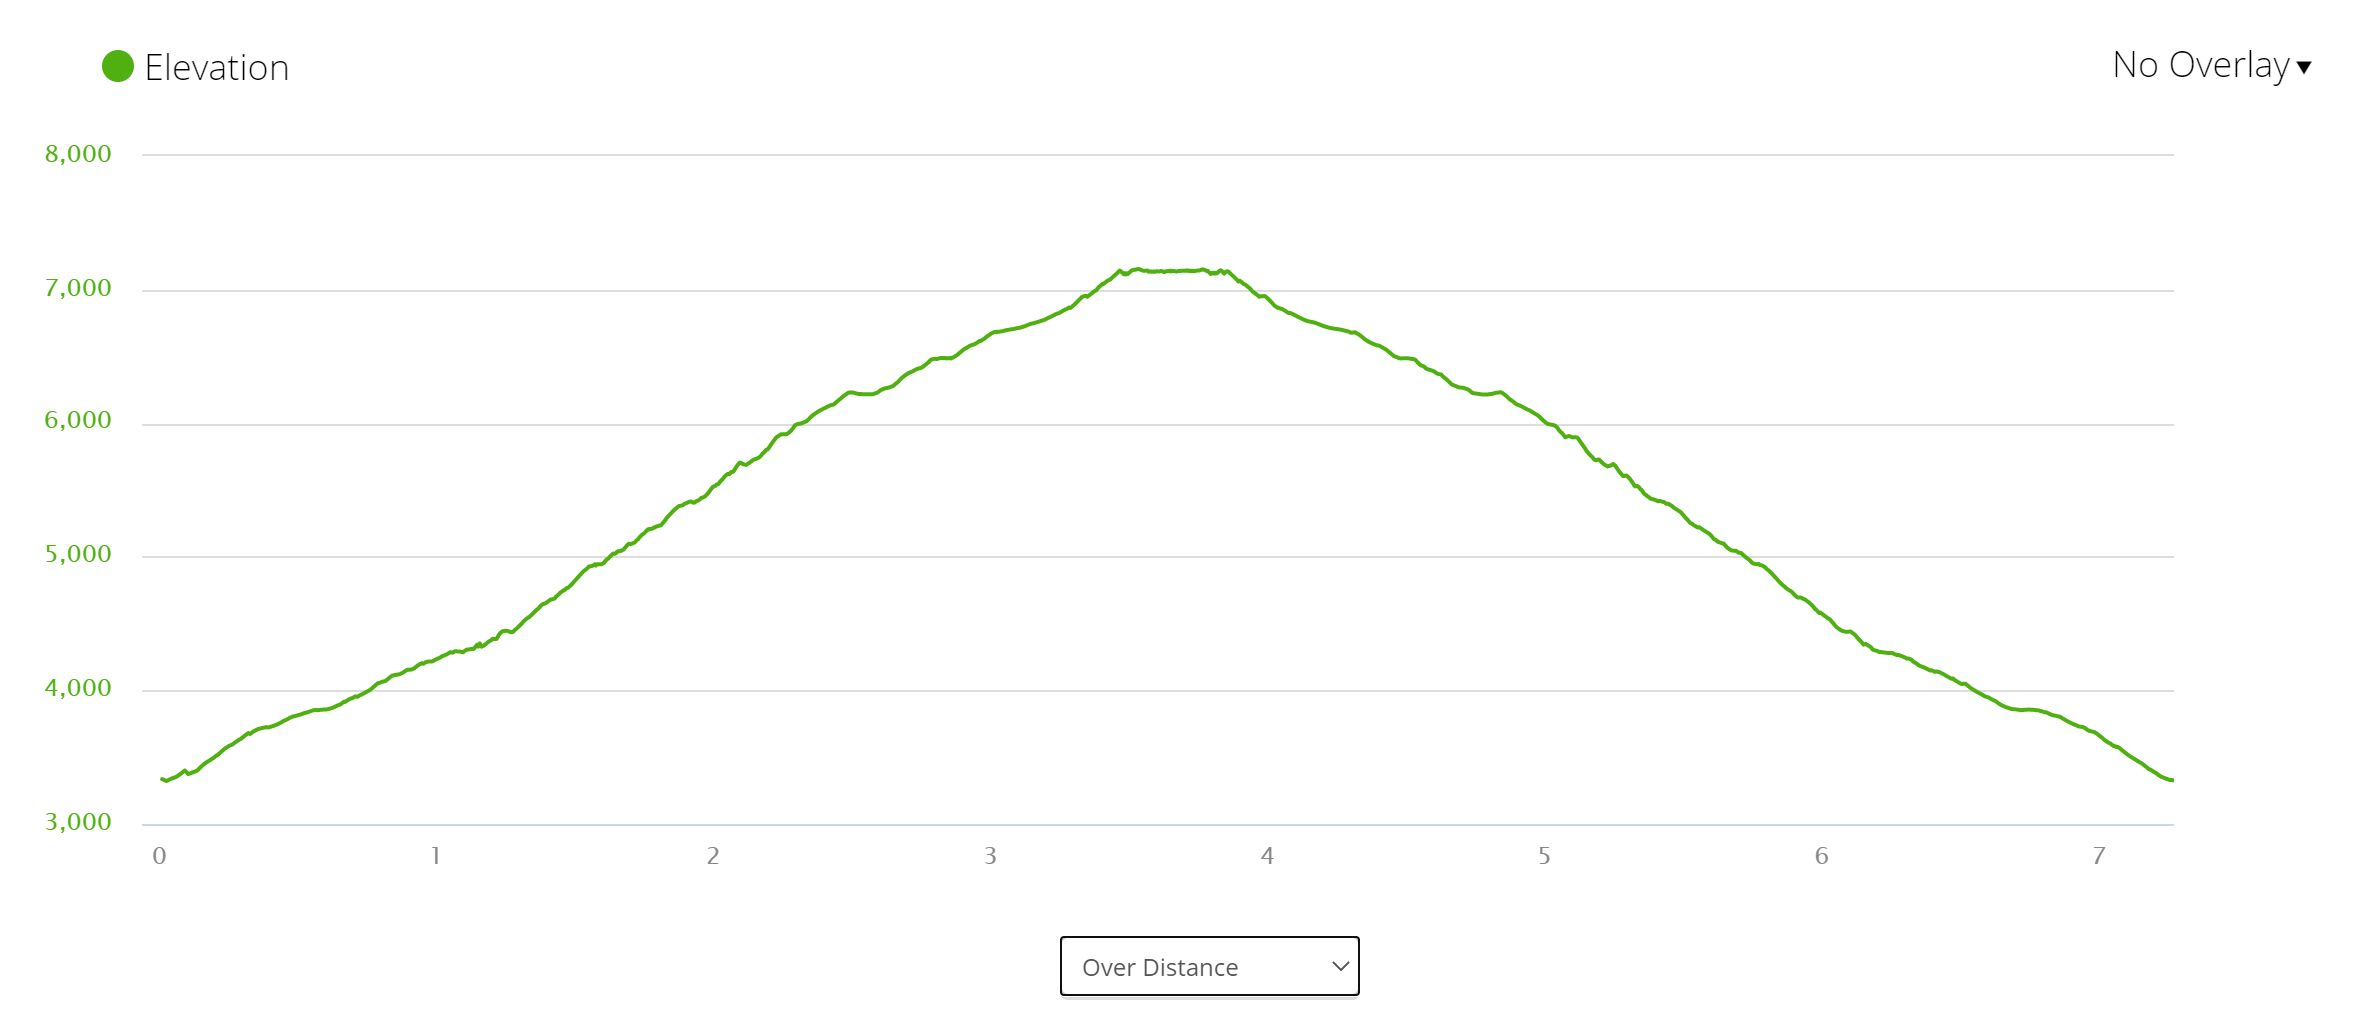 Ousel Peak - Elevation